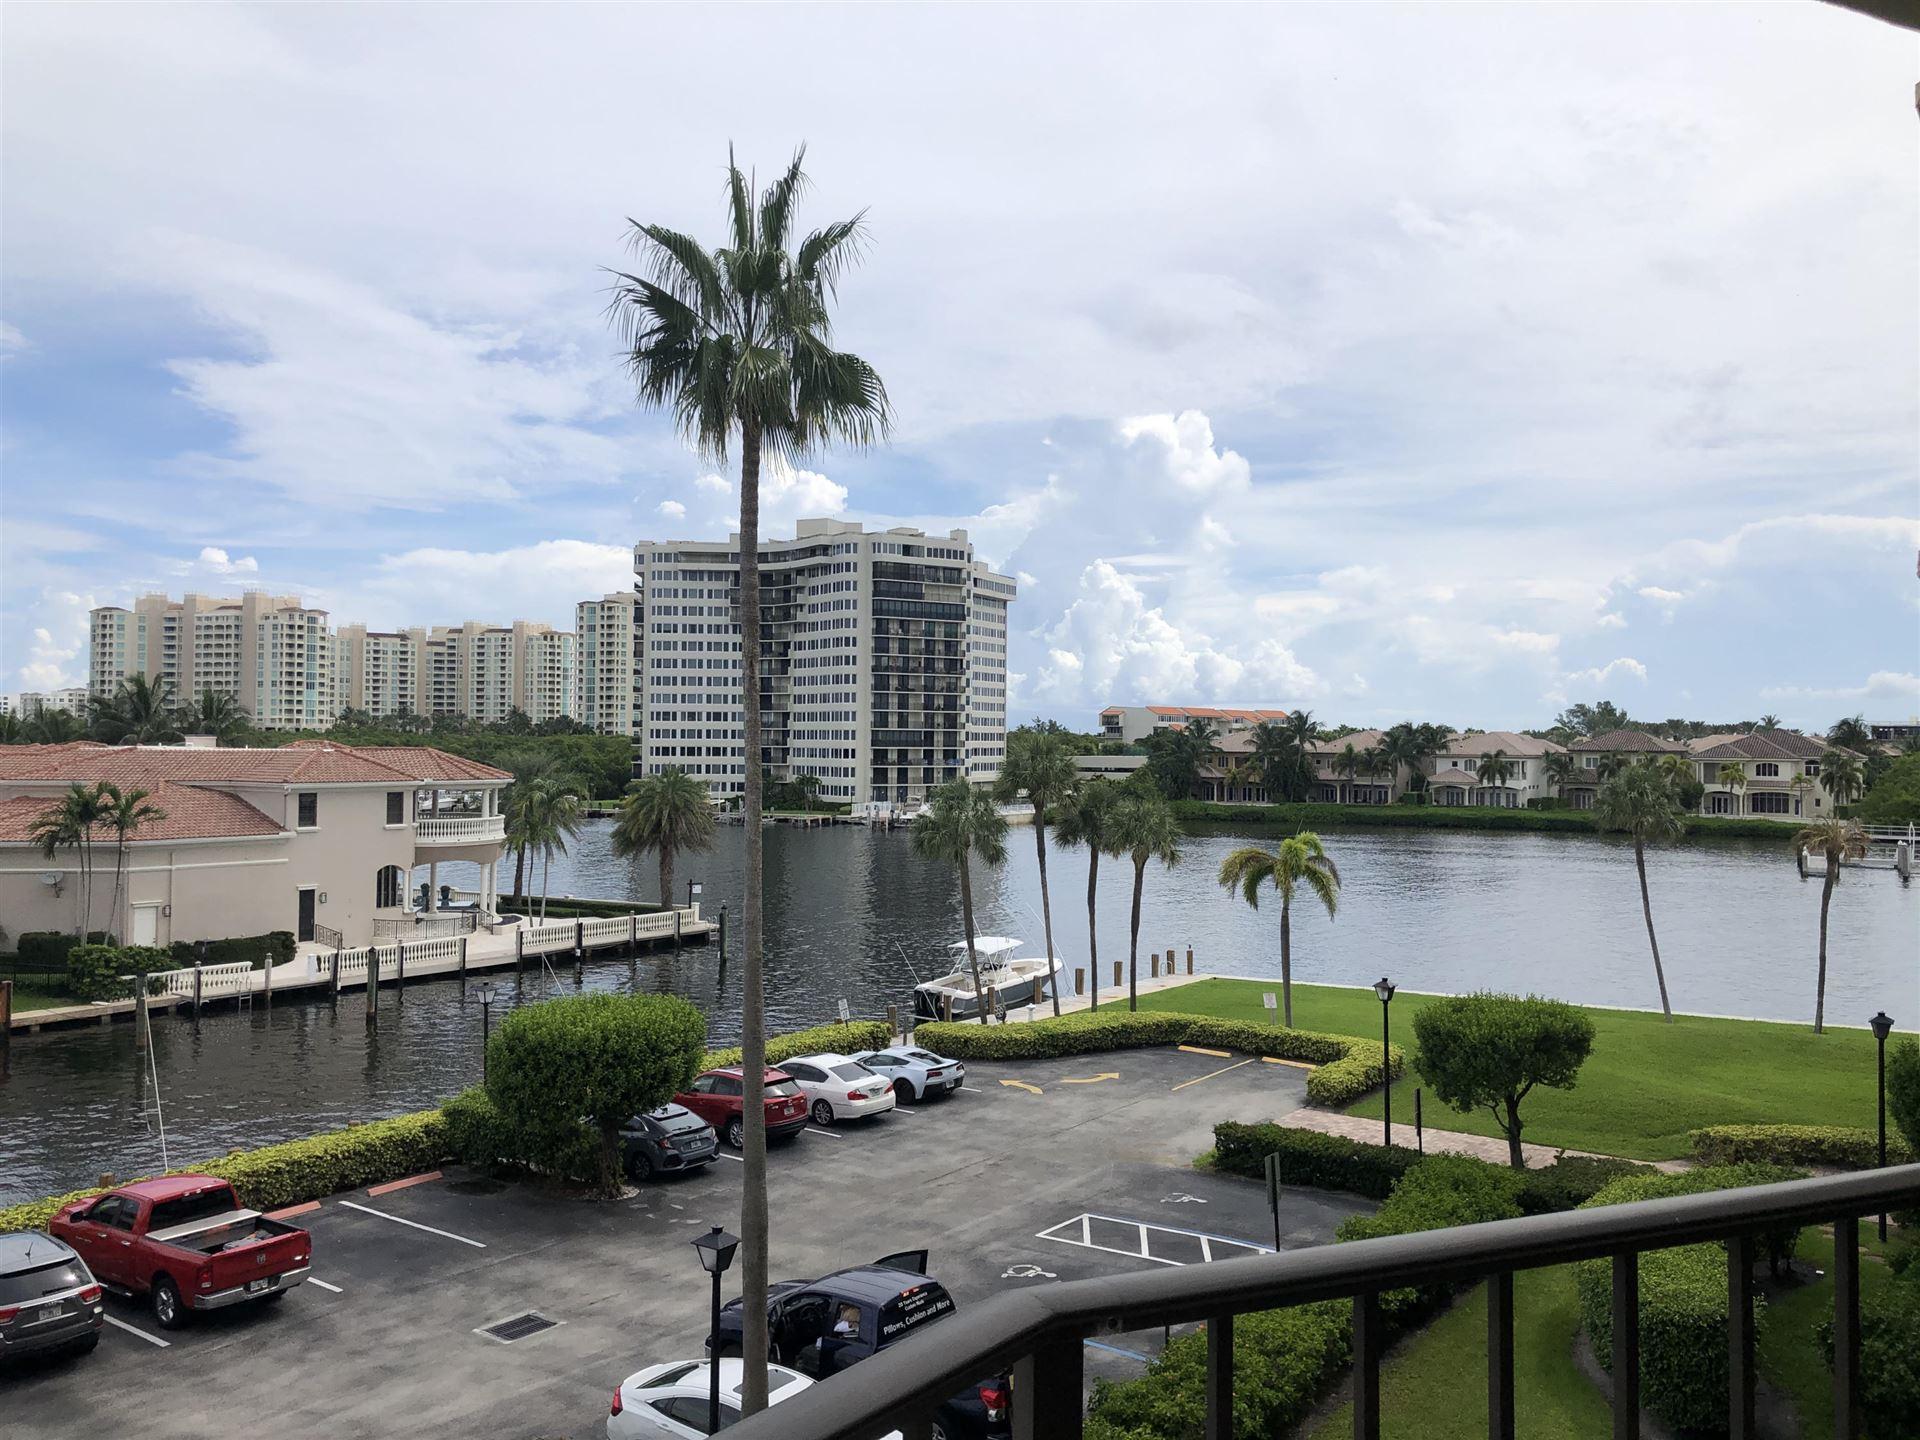 899 Jeffery Street #408, Boca Raton, FL 33487 - #: RX-10648074